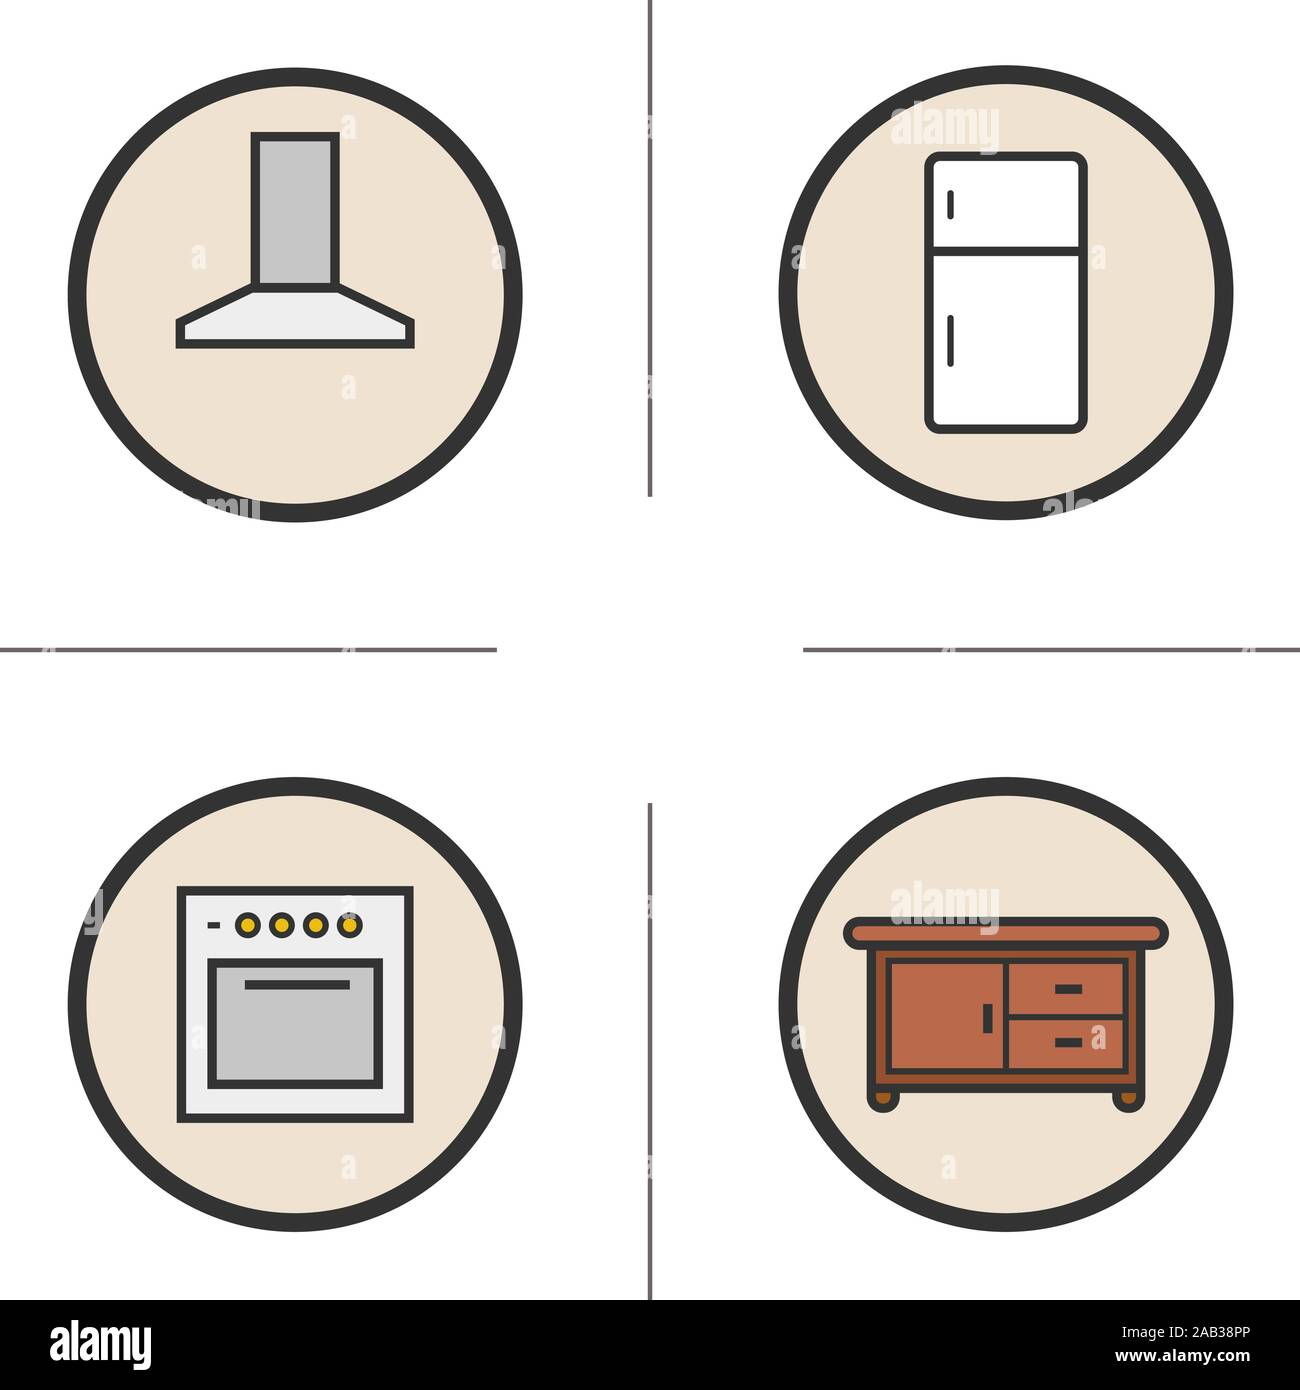 Kitchen Interior Color Icons Set Extractor Hood Fridge